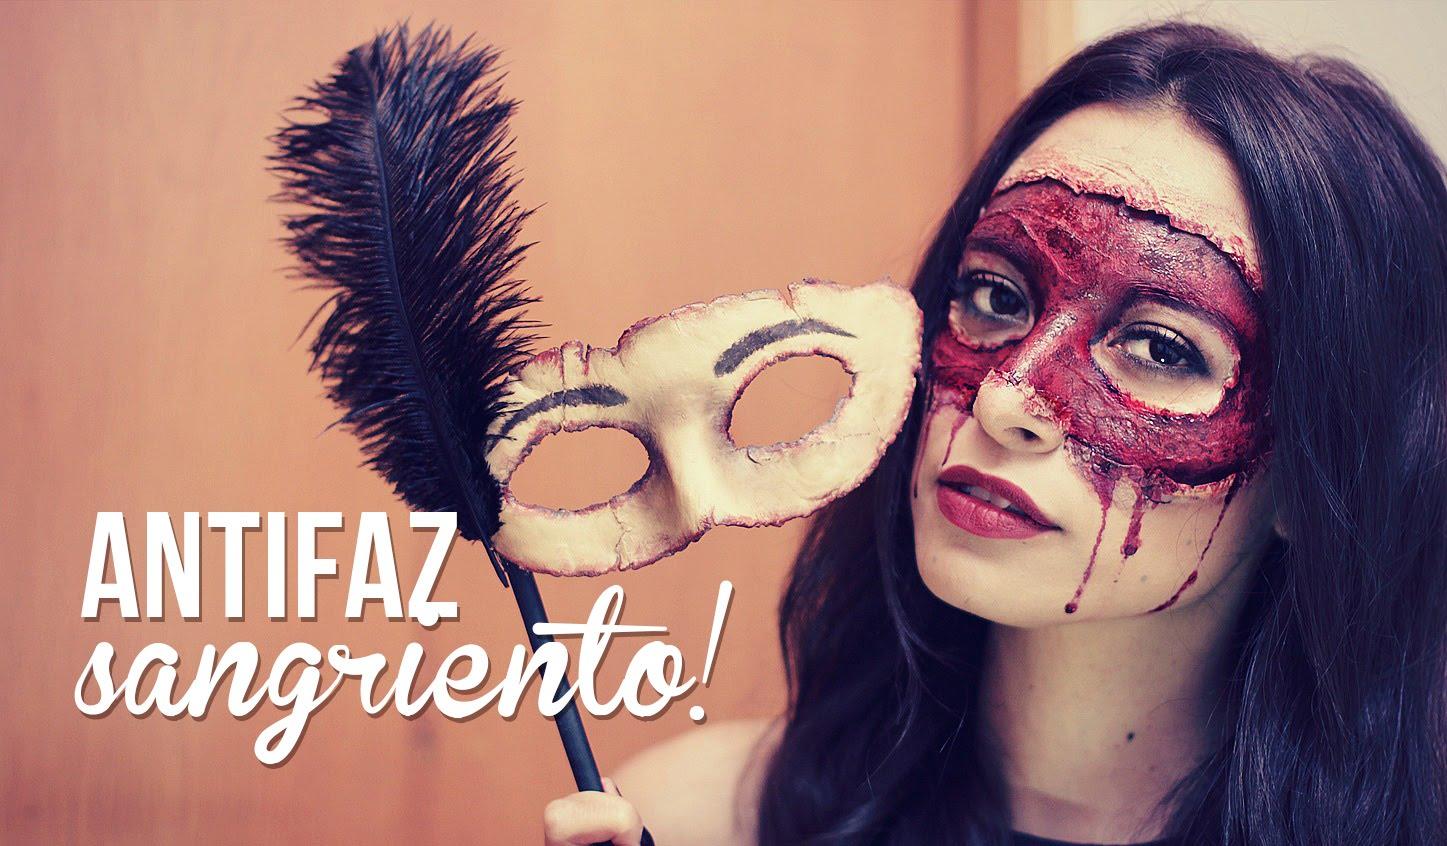 Maquillaje de antifaz sangriento para halloween for Disfraces antifaz